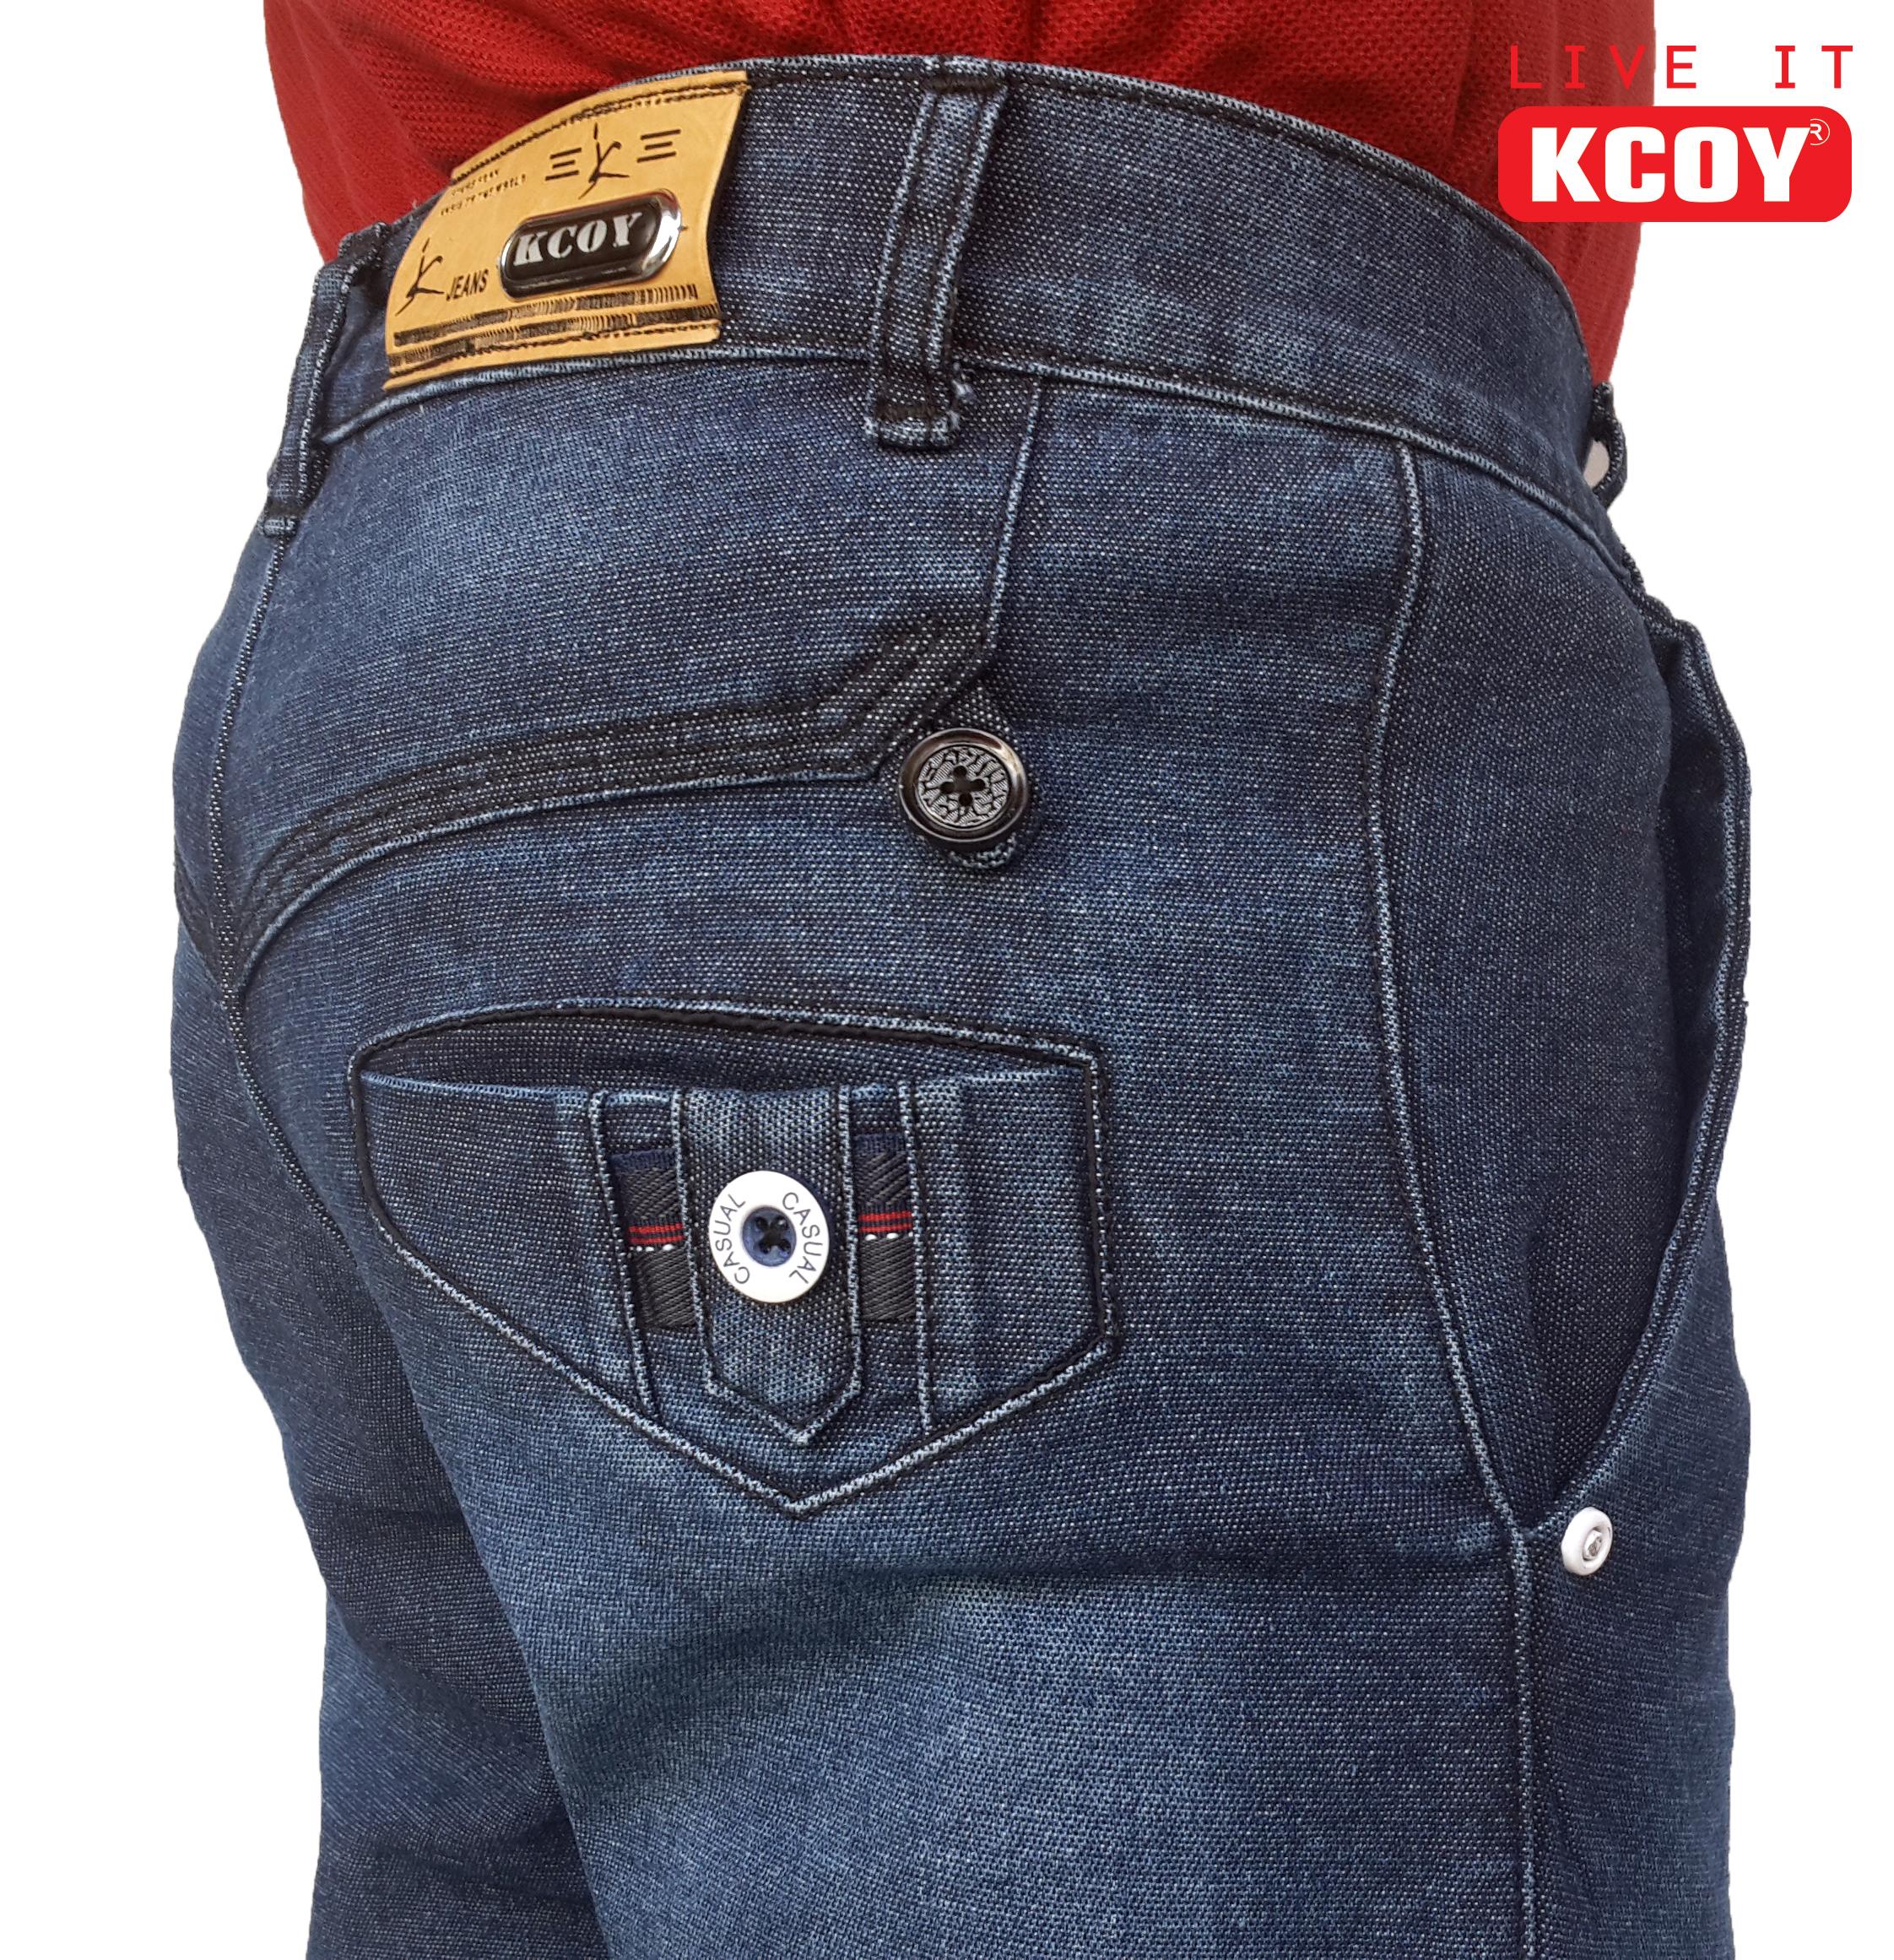 KCOY JEANS